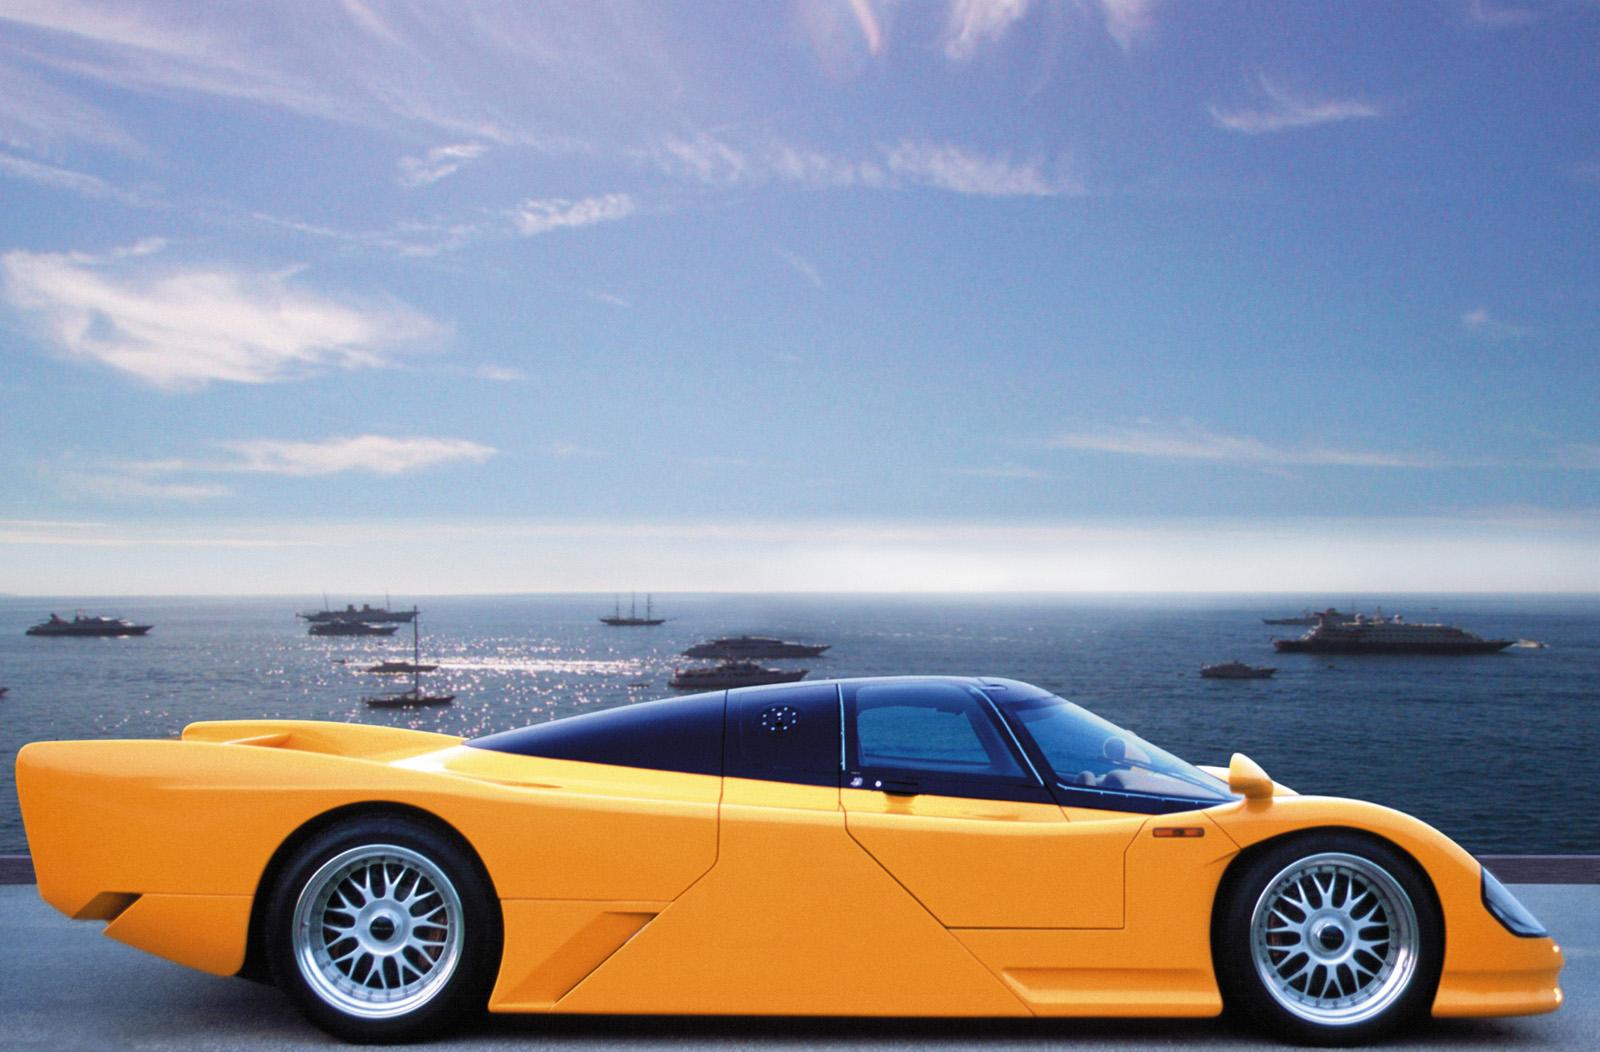 ingyenes háttérképek : sportkocsi, mclaren f1, lamborghini diablo